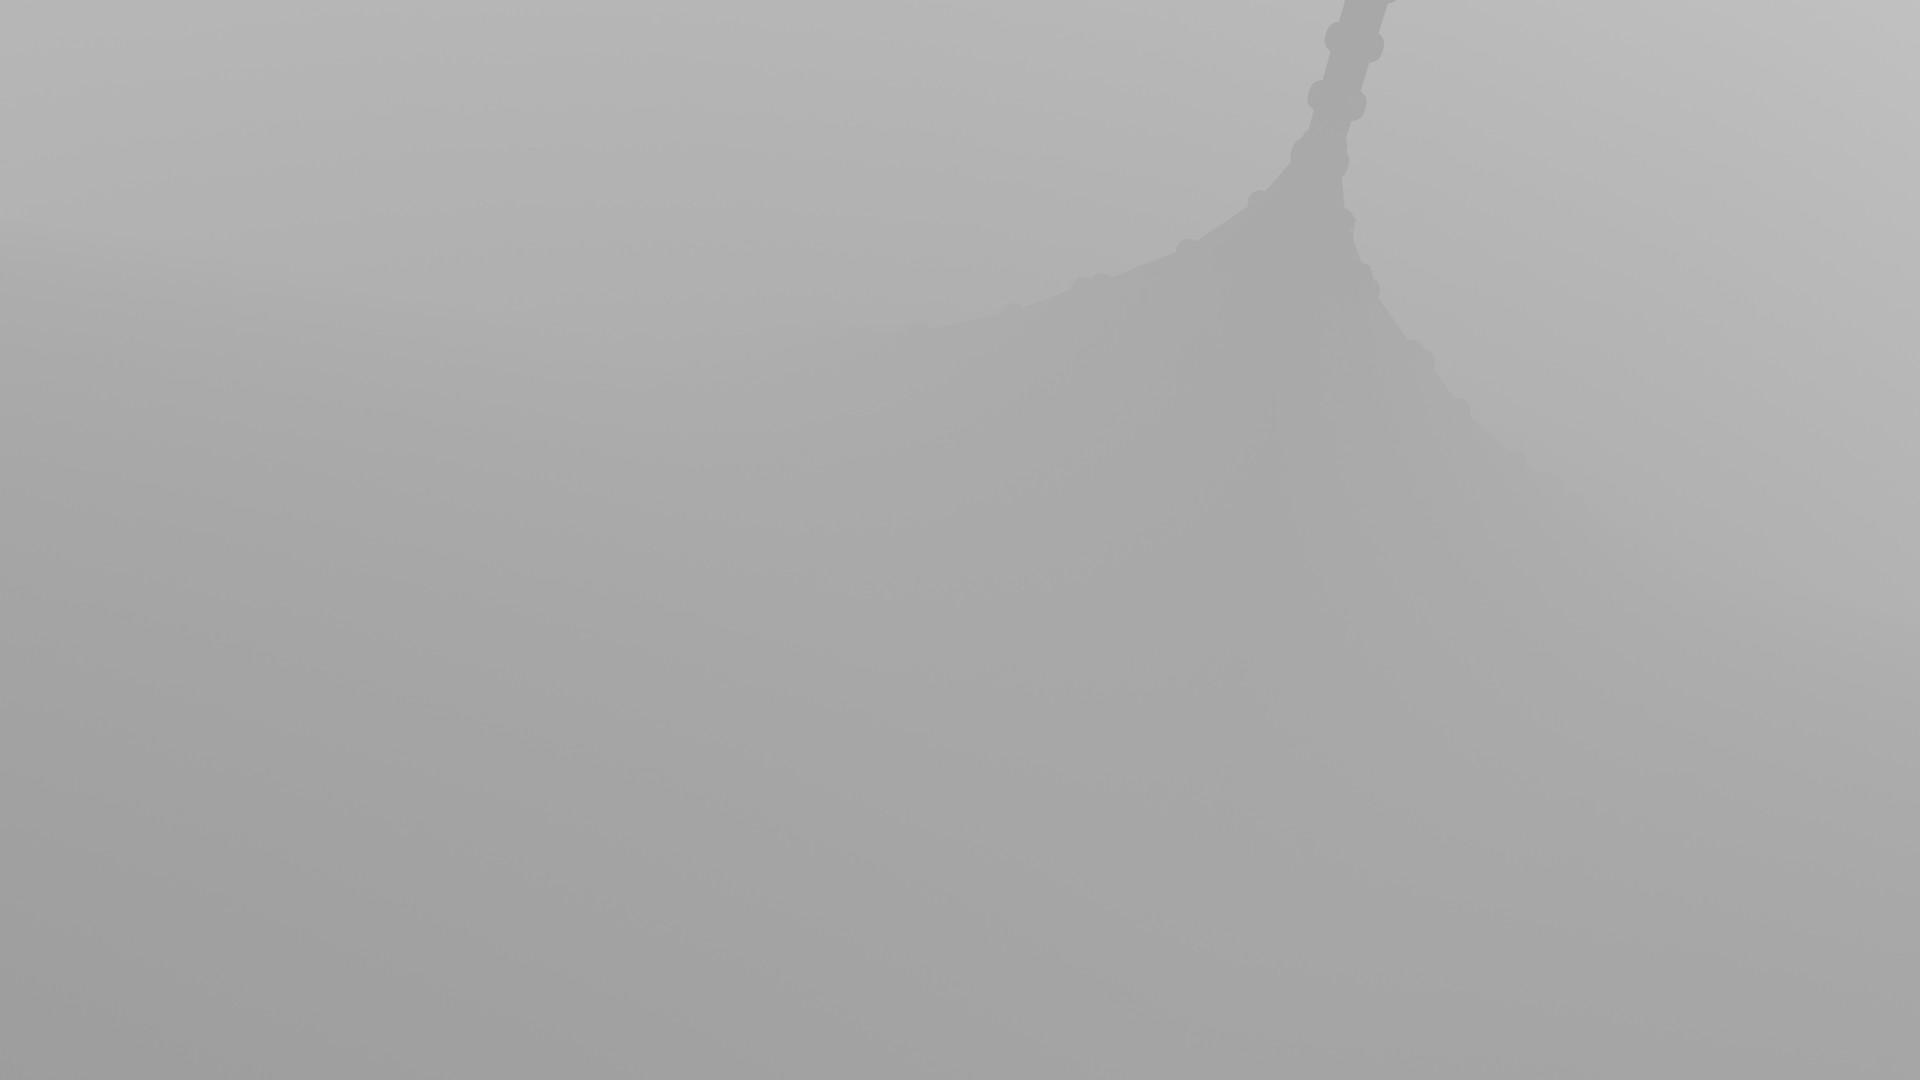 Kresimir jelusic robob3ar 280 190716 z